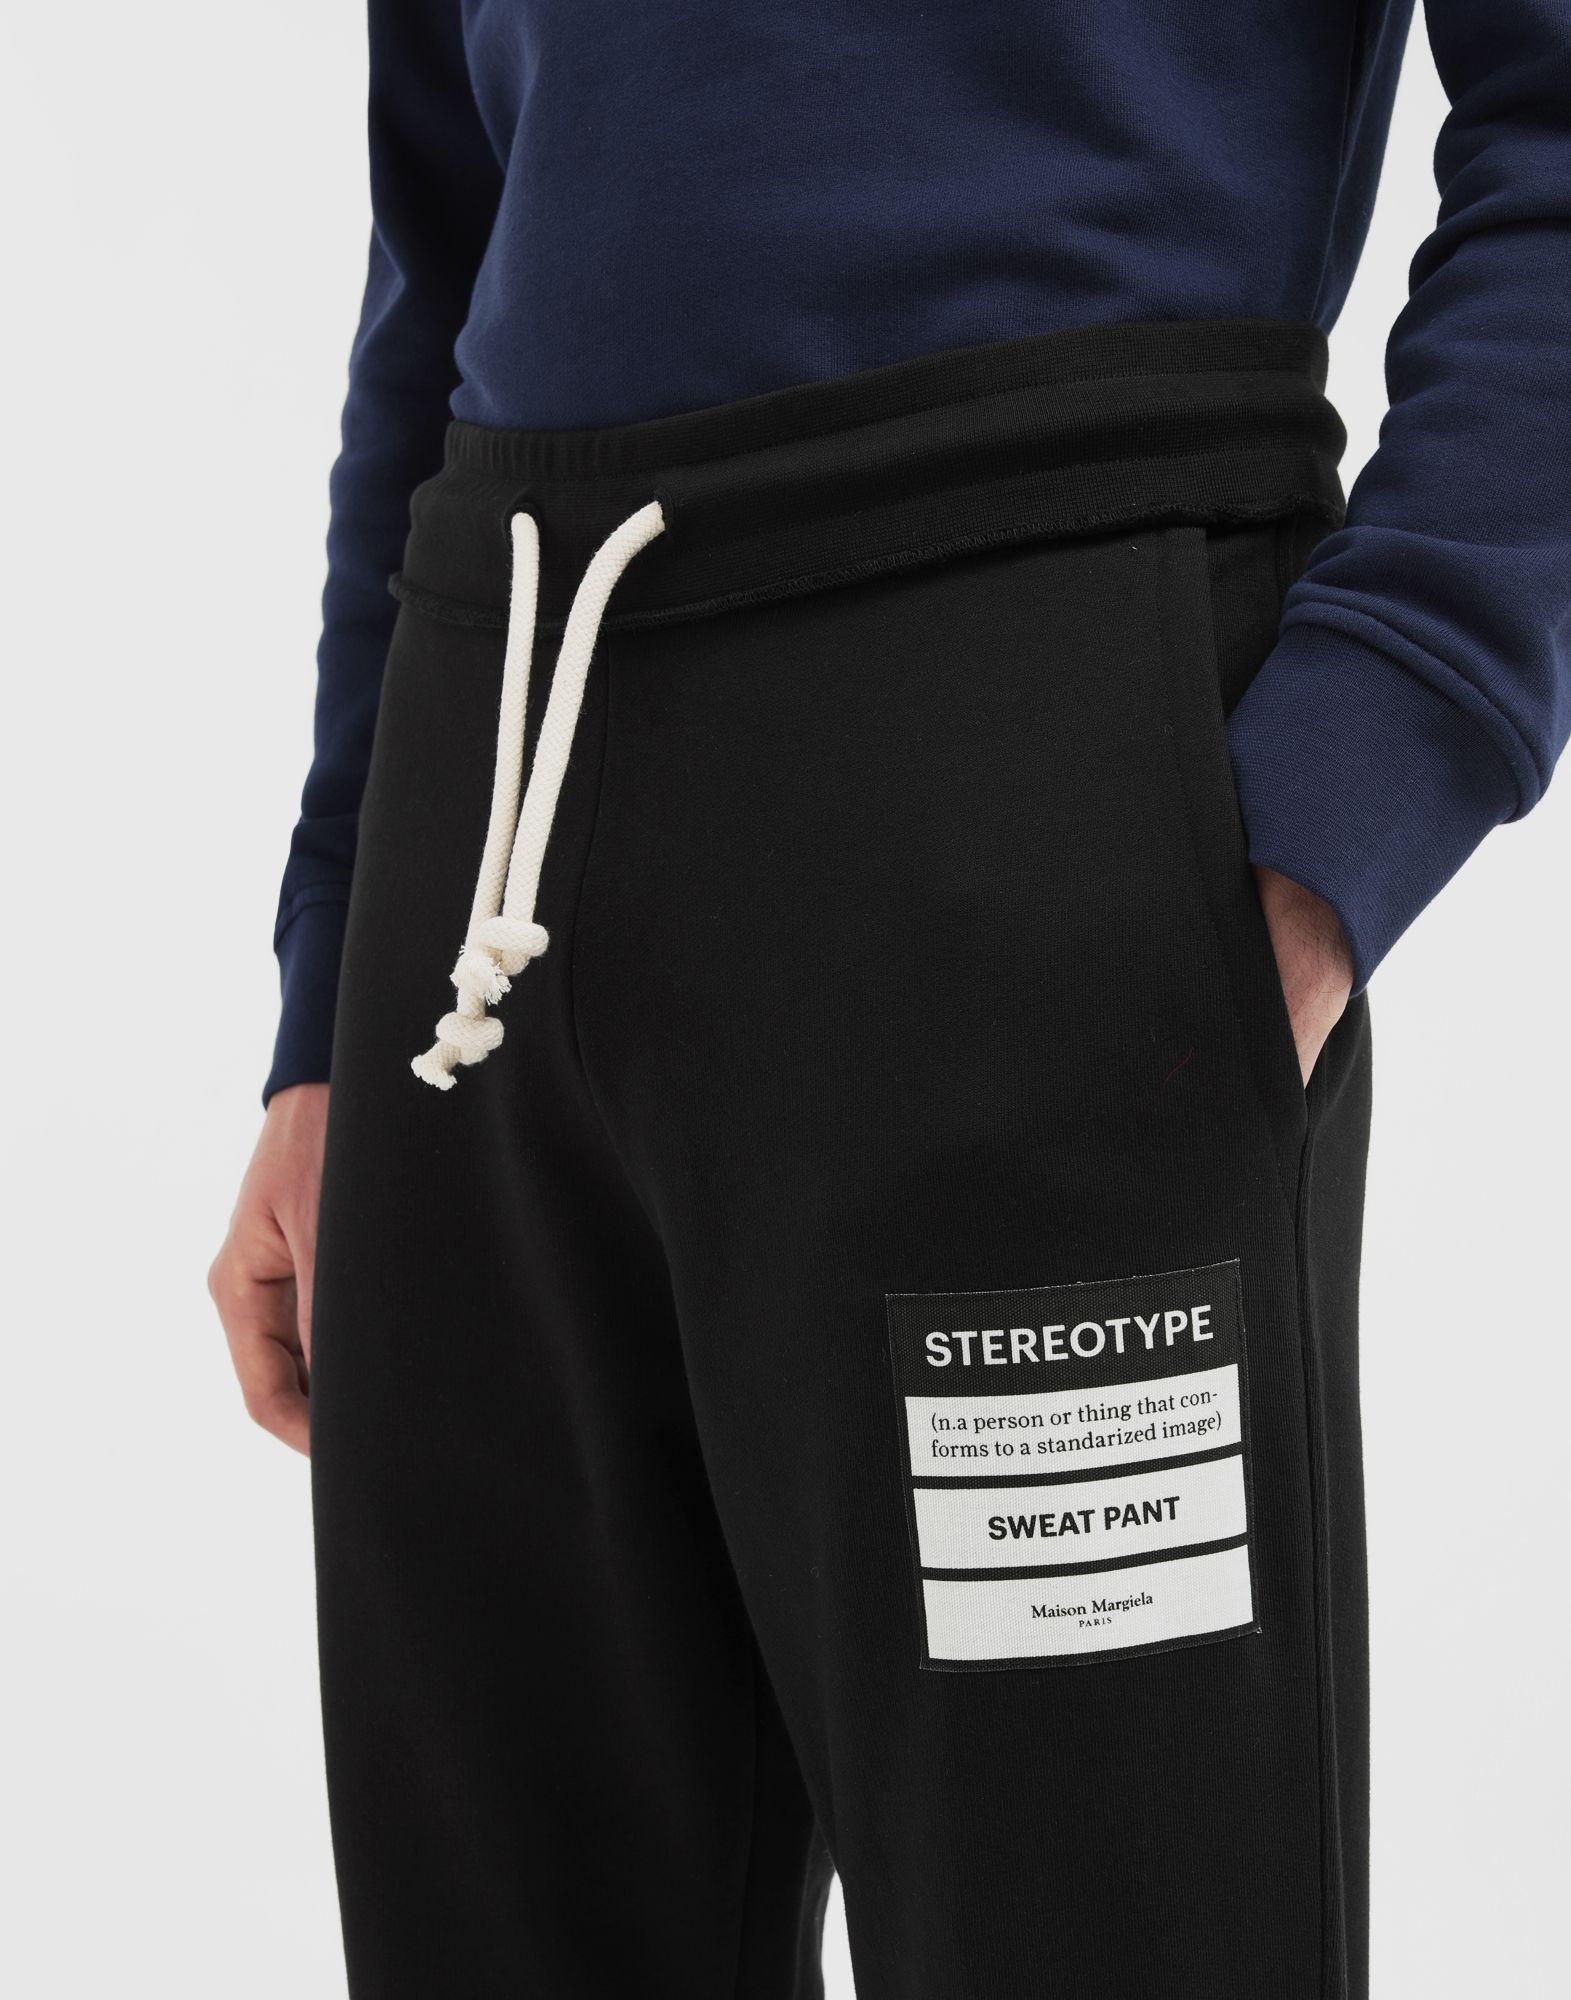 MAISON MARGIELA Stereotype jogging pants Casual pants Man a